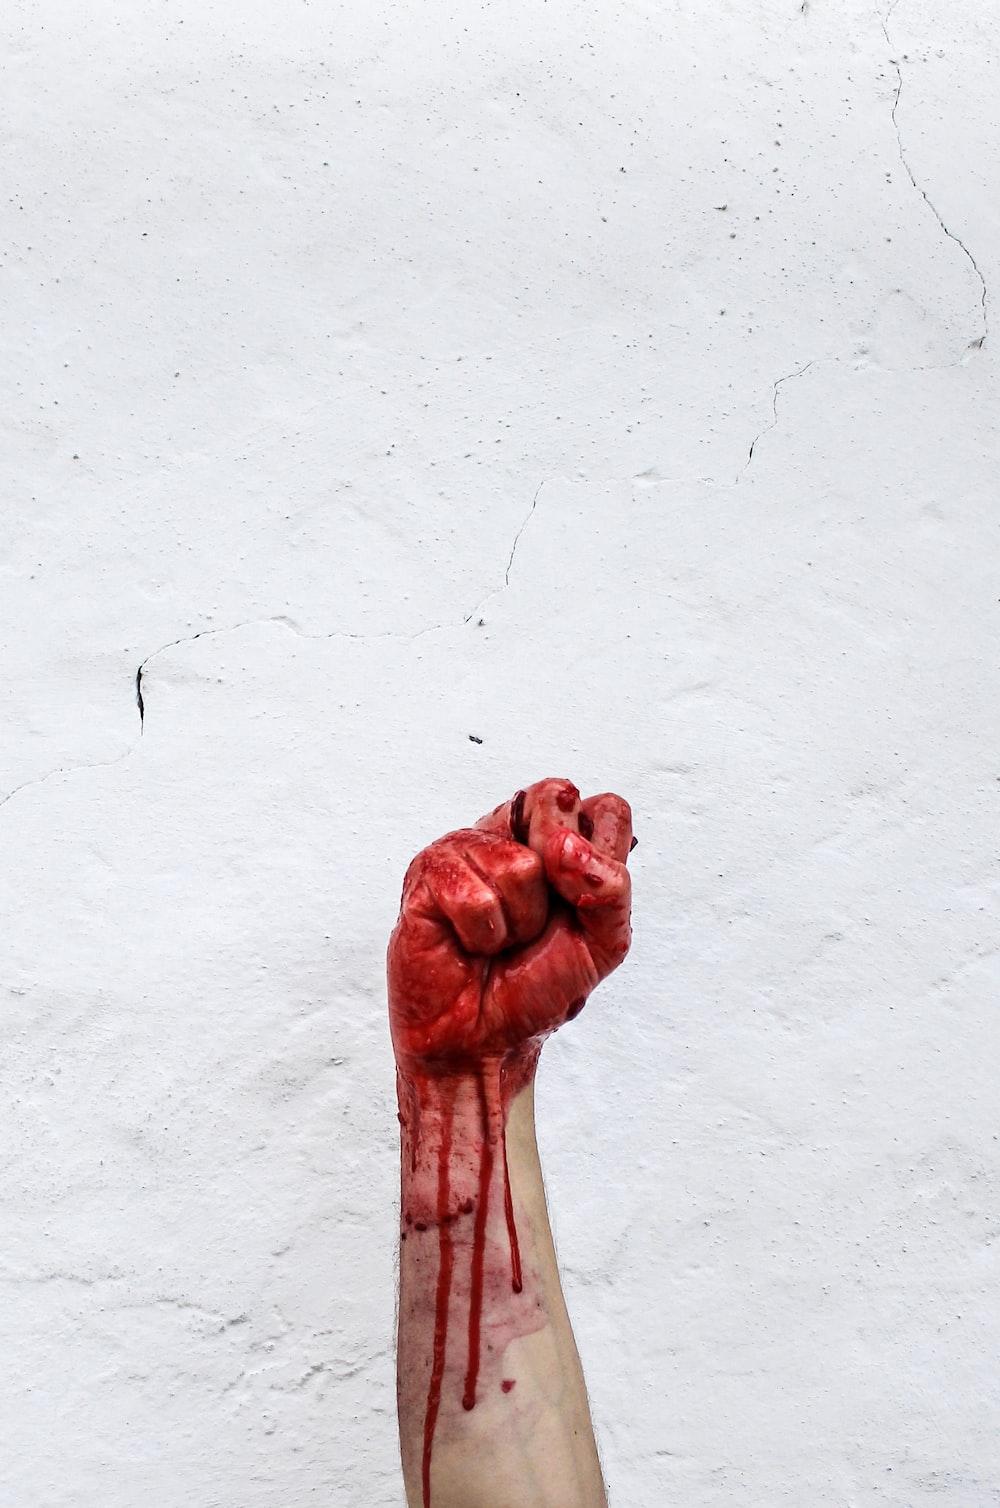 person raishing his hand